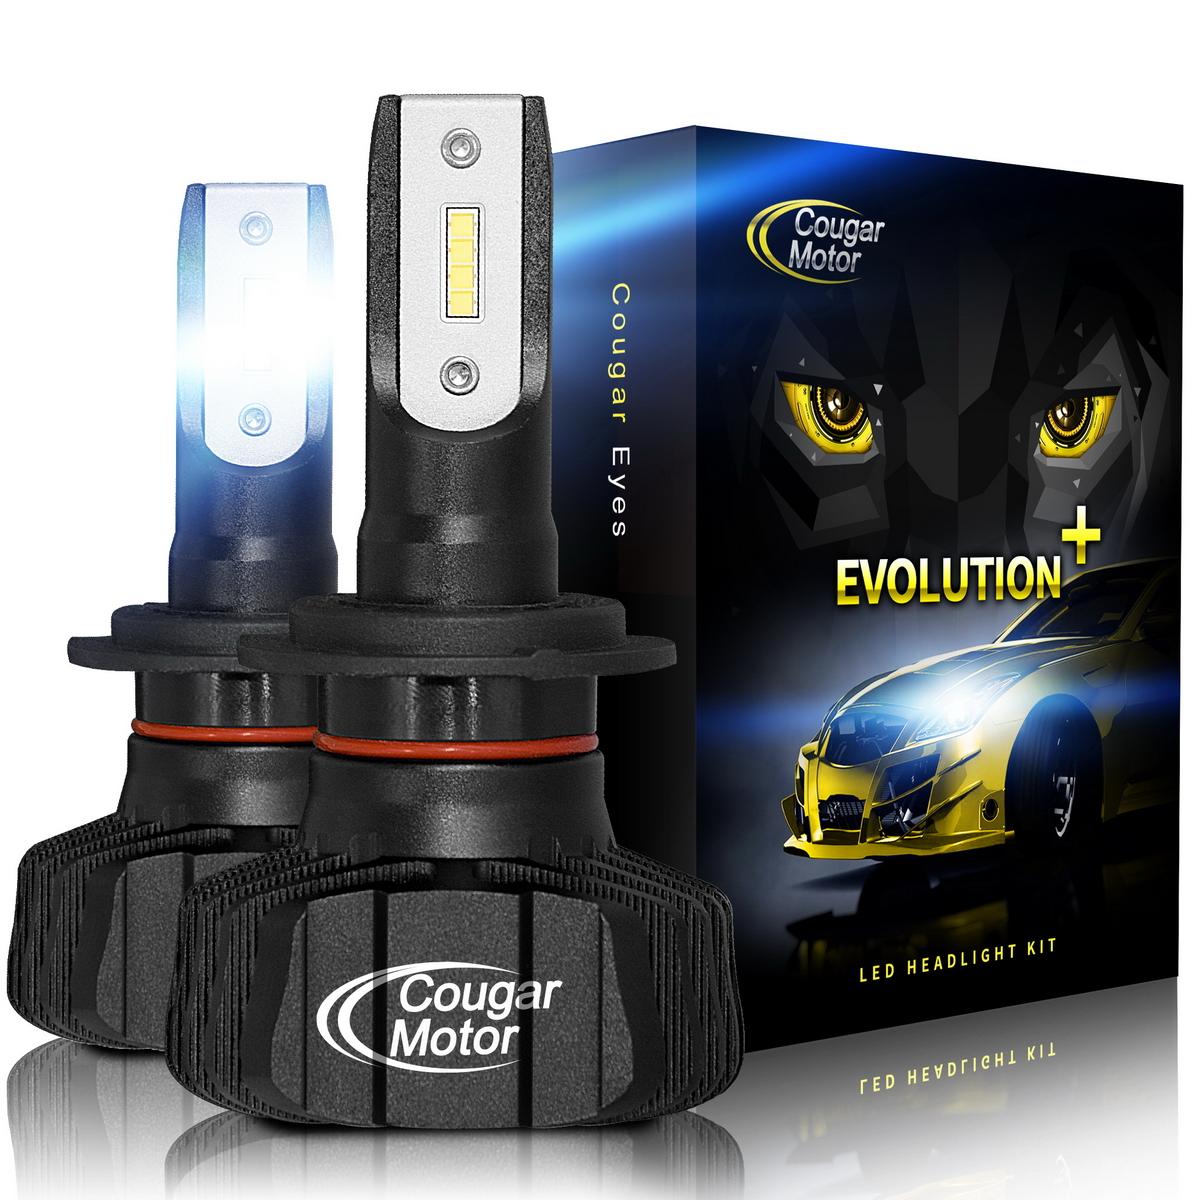 360/°Adjustable Beam 3D Bionic Technology High//Low Fanless Conversion Kit 9600Lm 6500K Cougar Motor 9007 Led headlight bulb